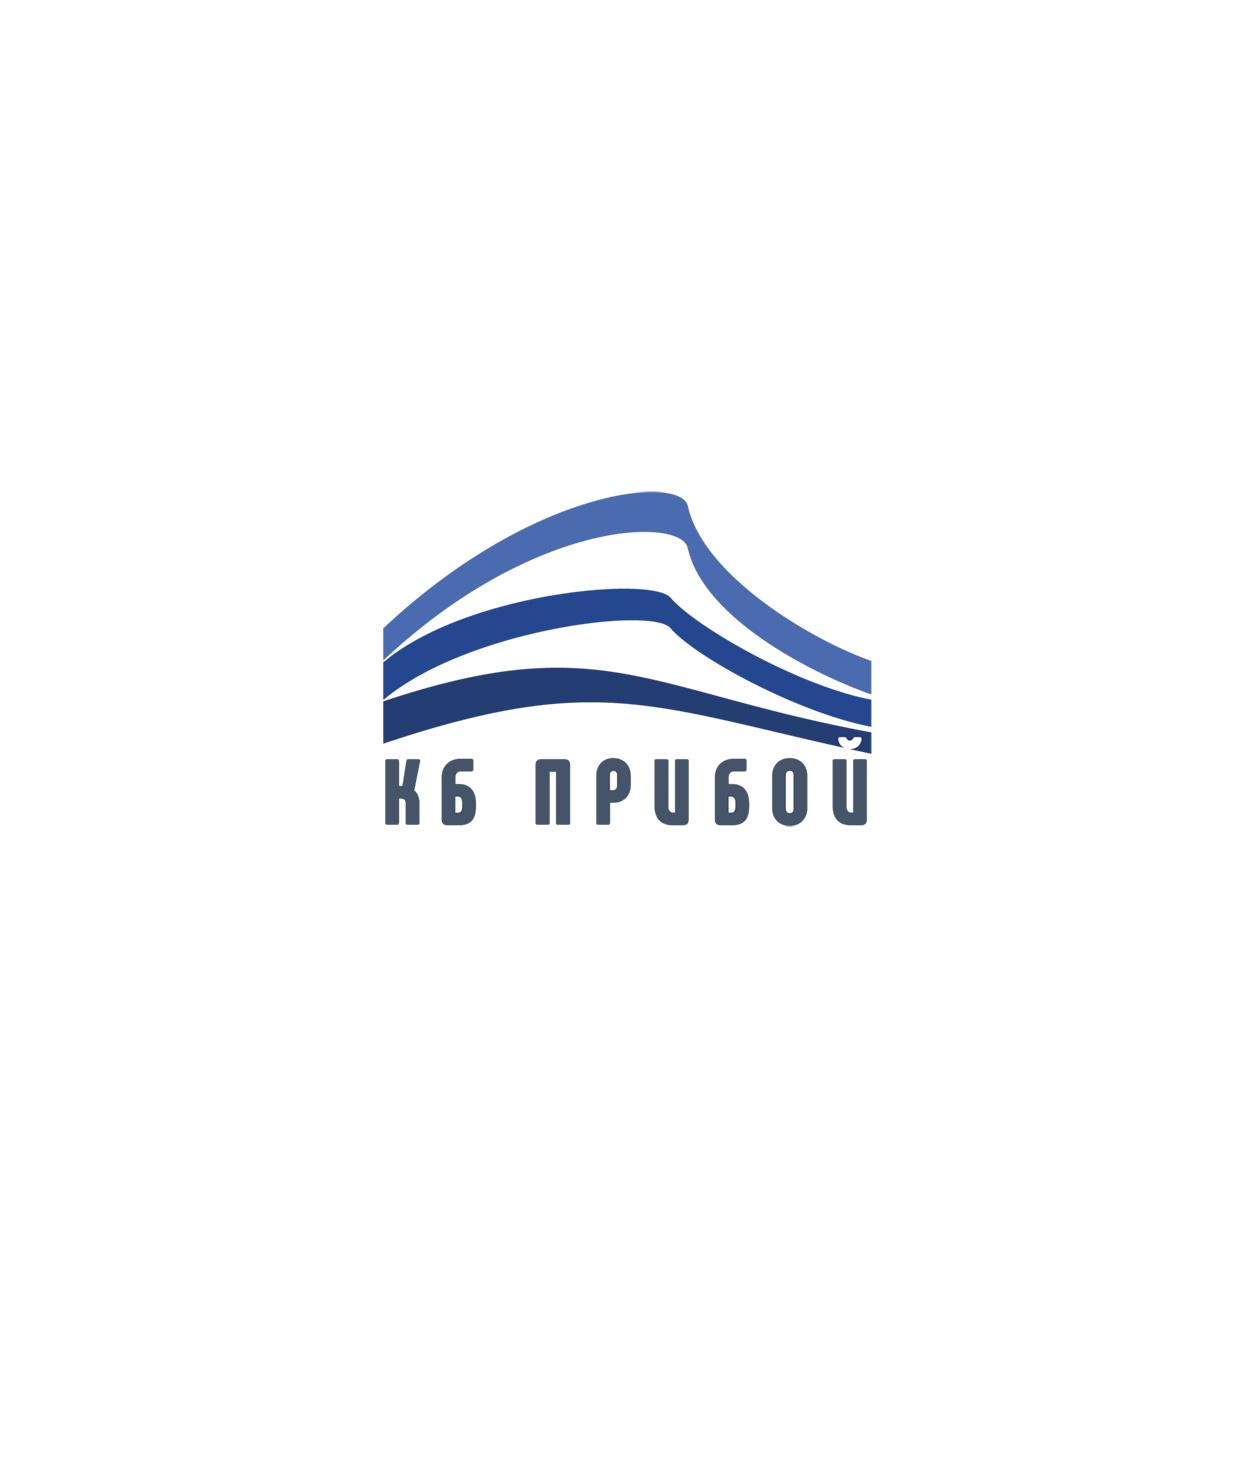 Разработка логотипа и фирменного стиля для КБ Прибой фото f_4485b2bd2c5da7f9.jpg